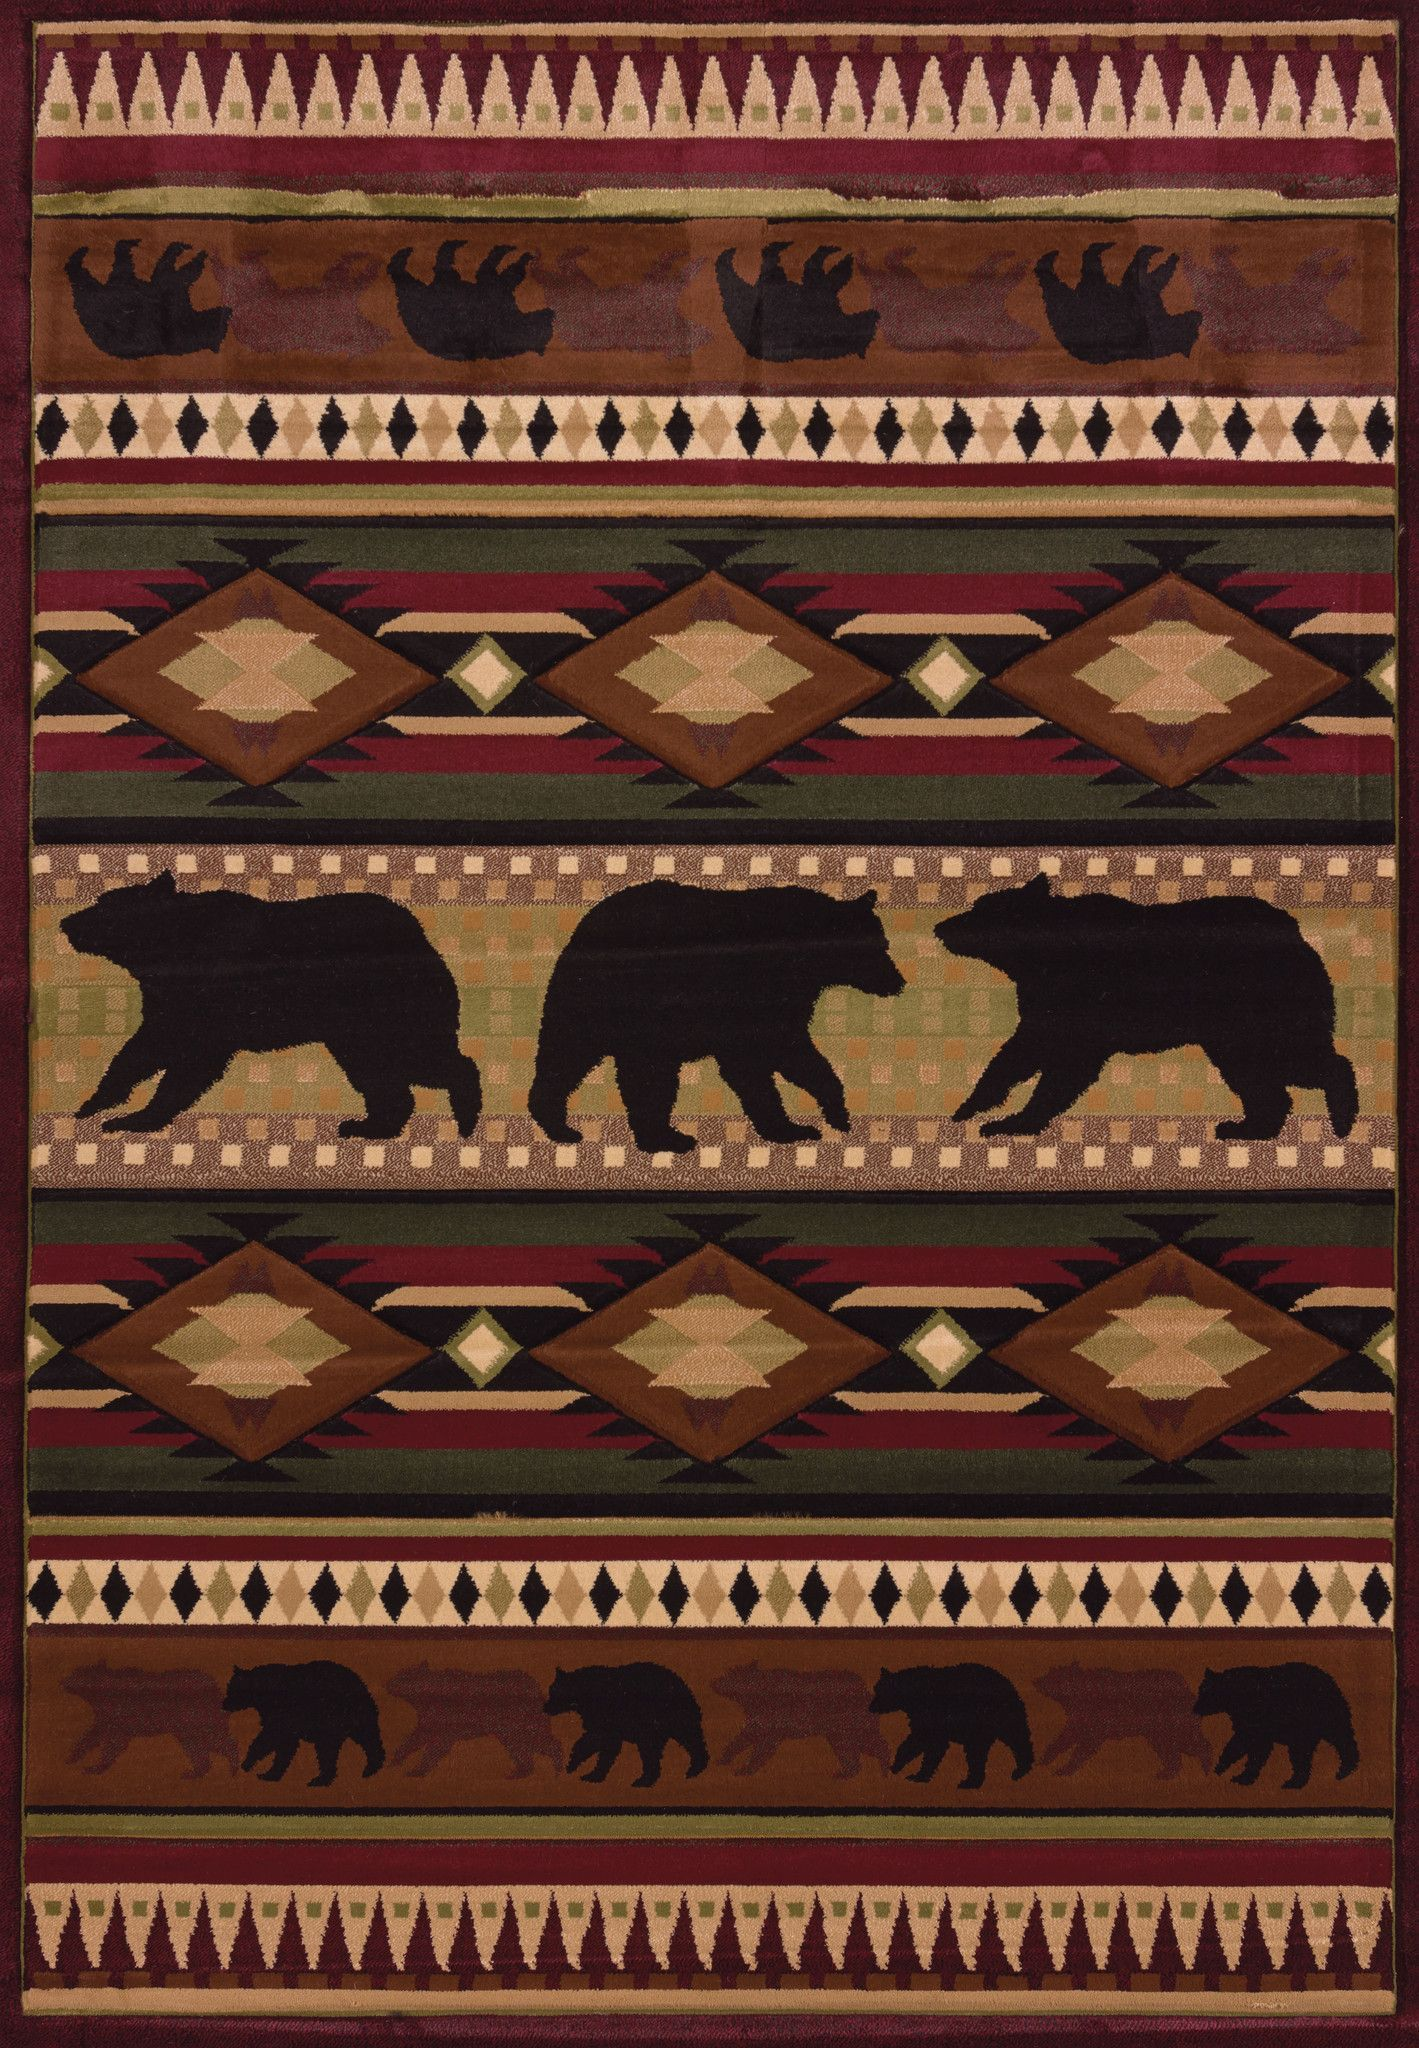 United Weaver Contours John Q Native Bear Area Rug